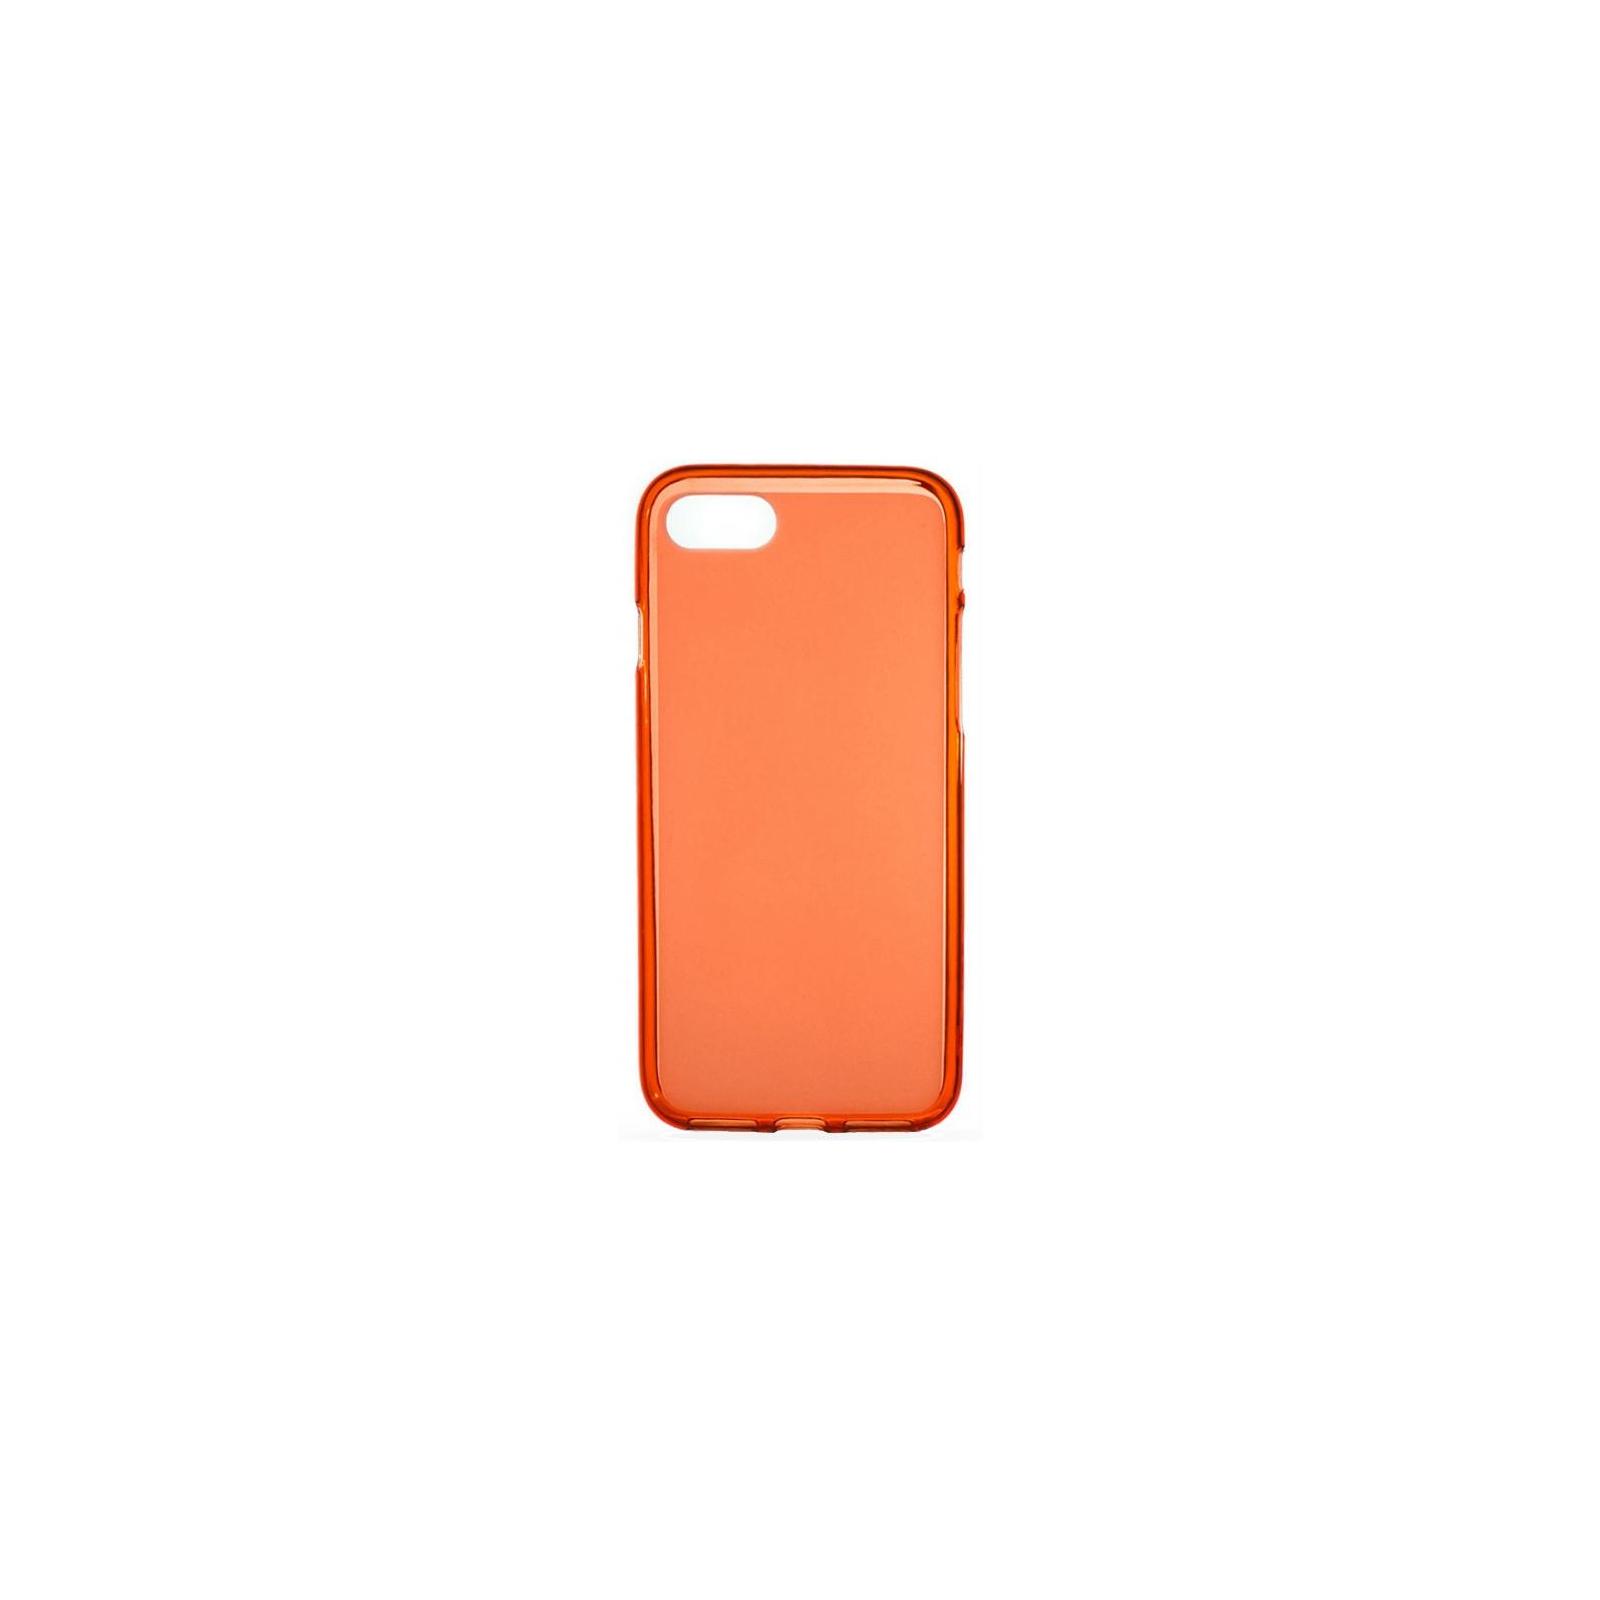 Чехол для моб. телефона Colorway TPU case for Apple iPhone 7/8, red (CW-CTPAI7-RD)